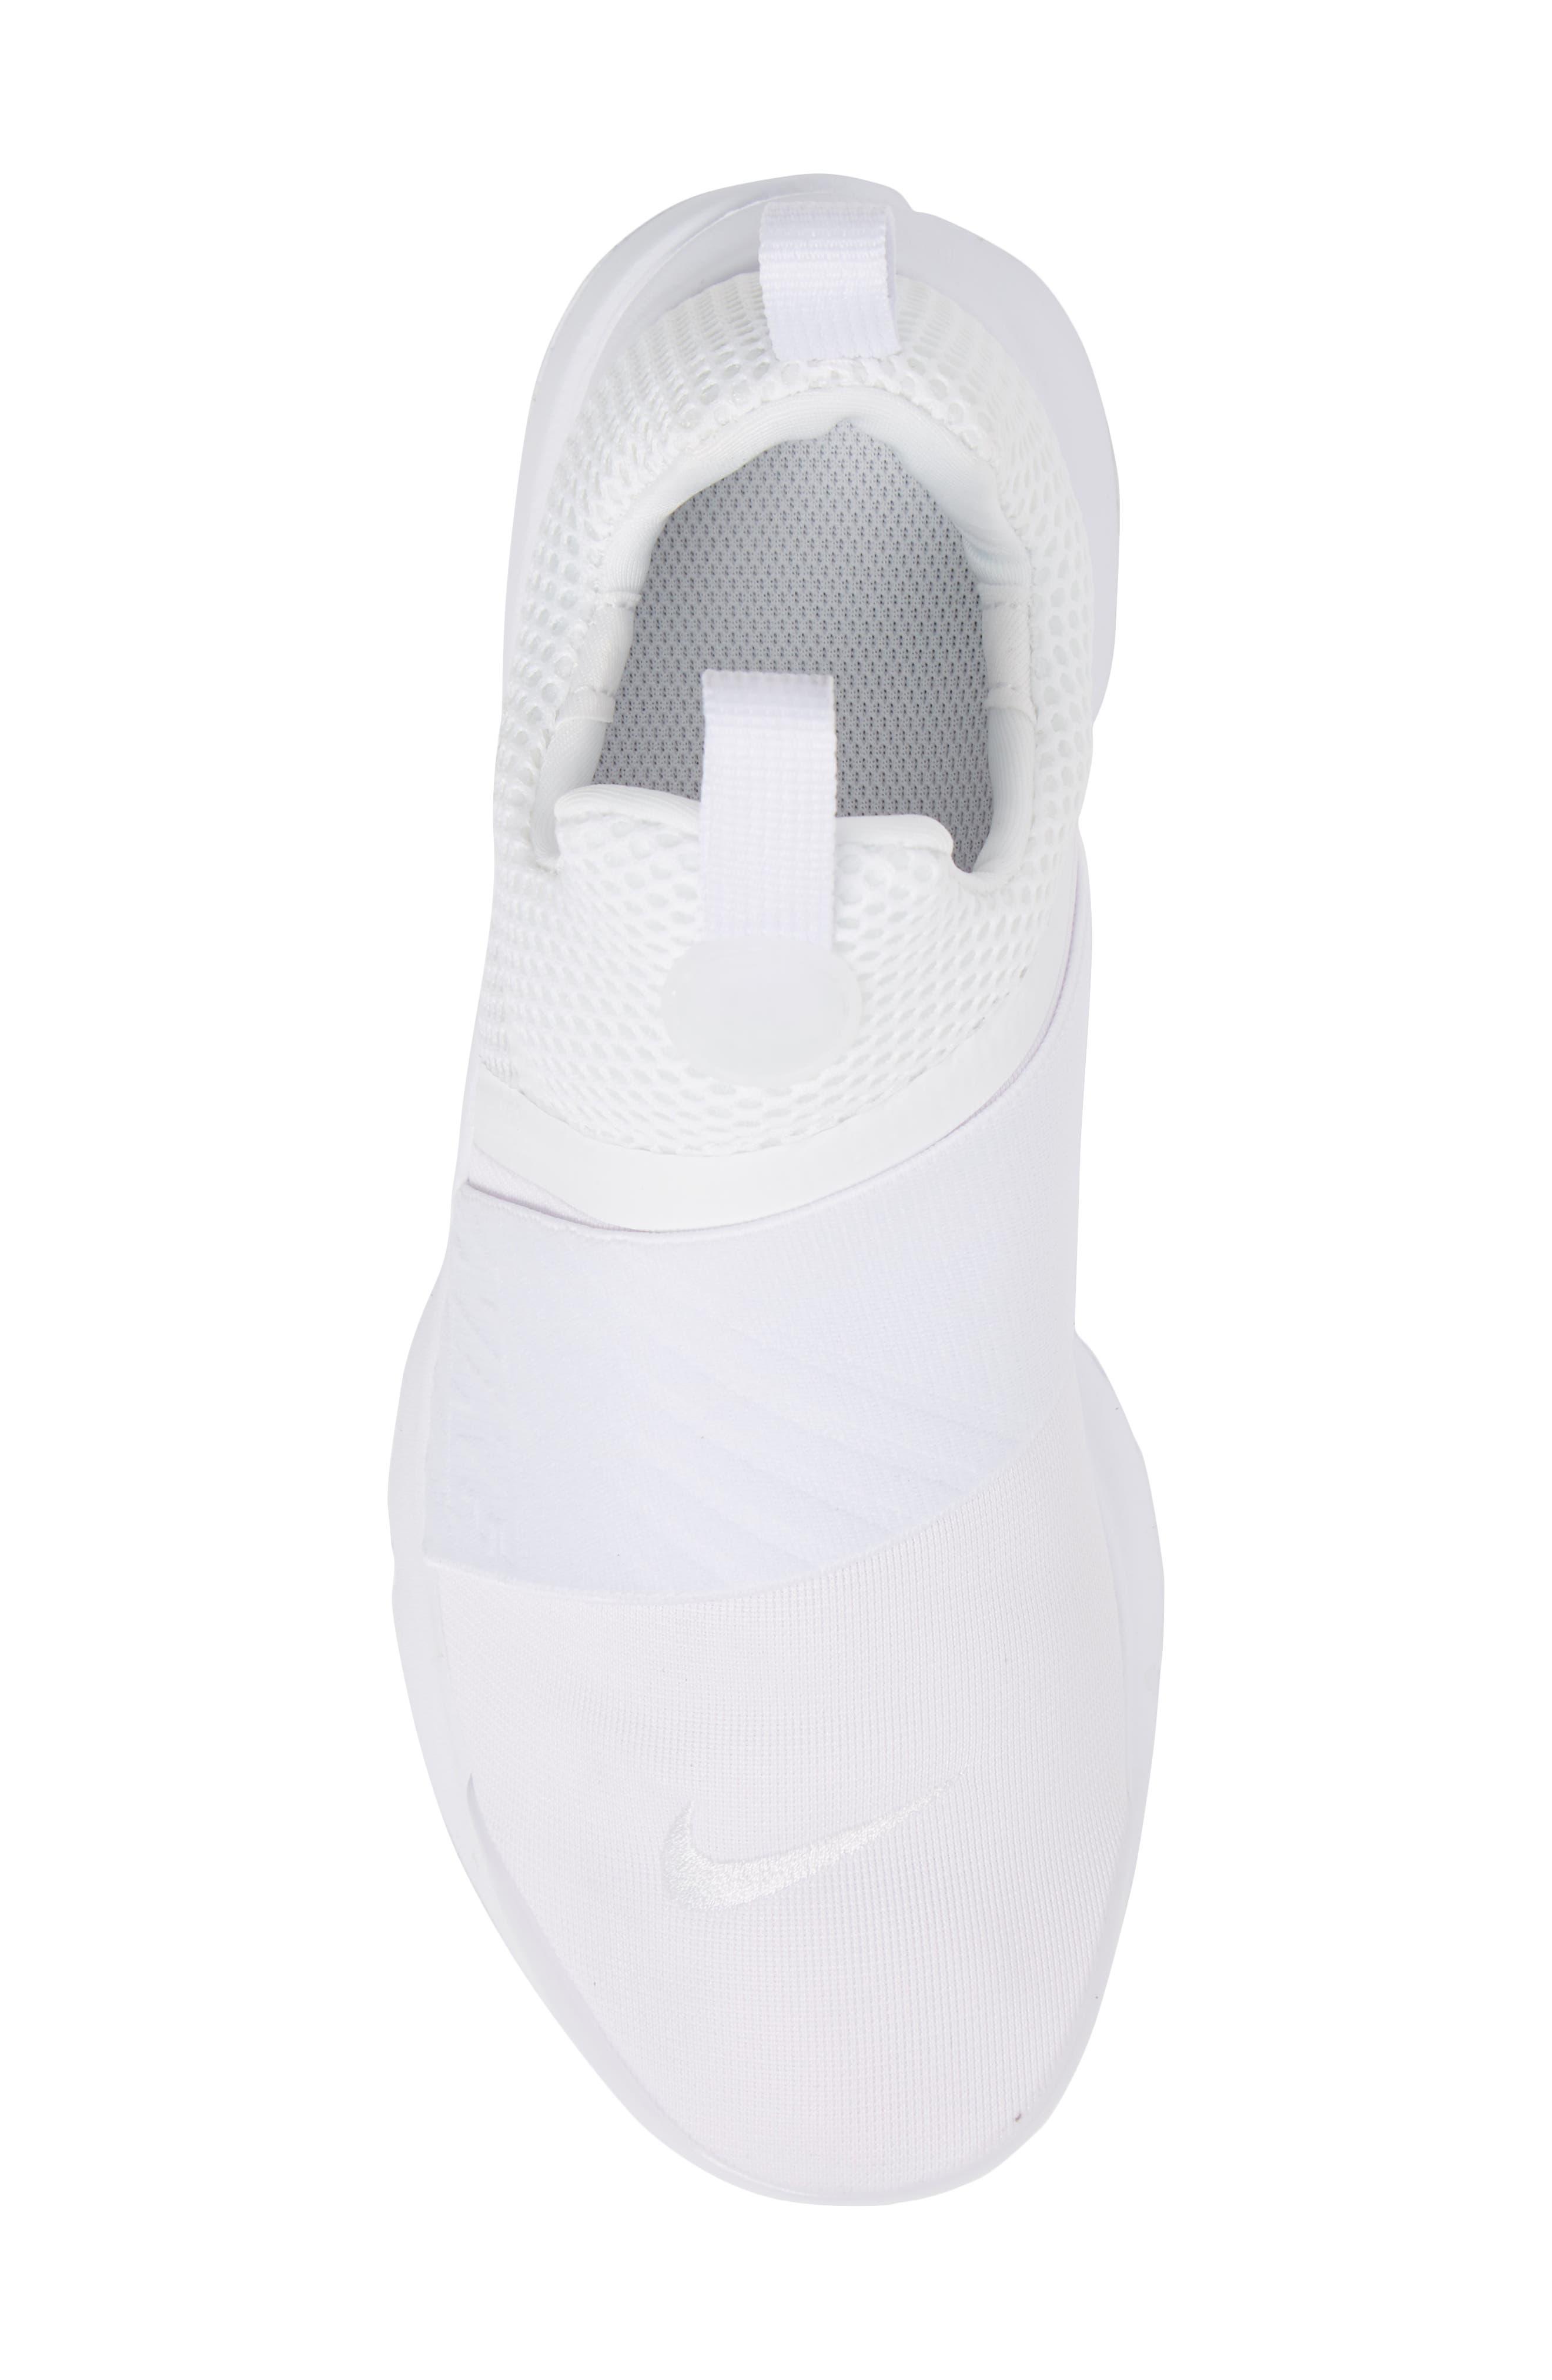 Presto Extreme Sneaker,                             Alternate thumbnail 48, color,